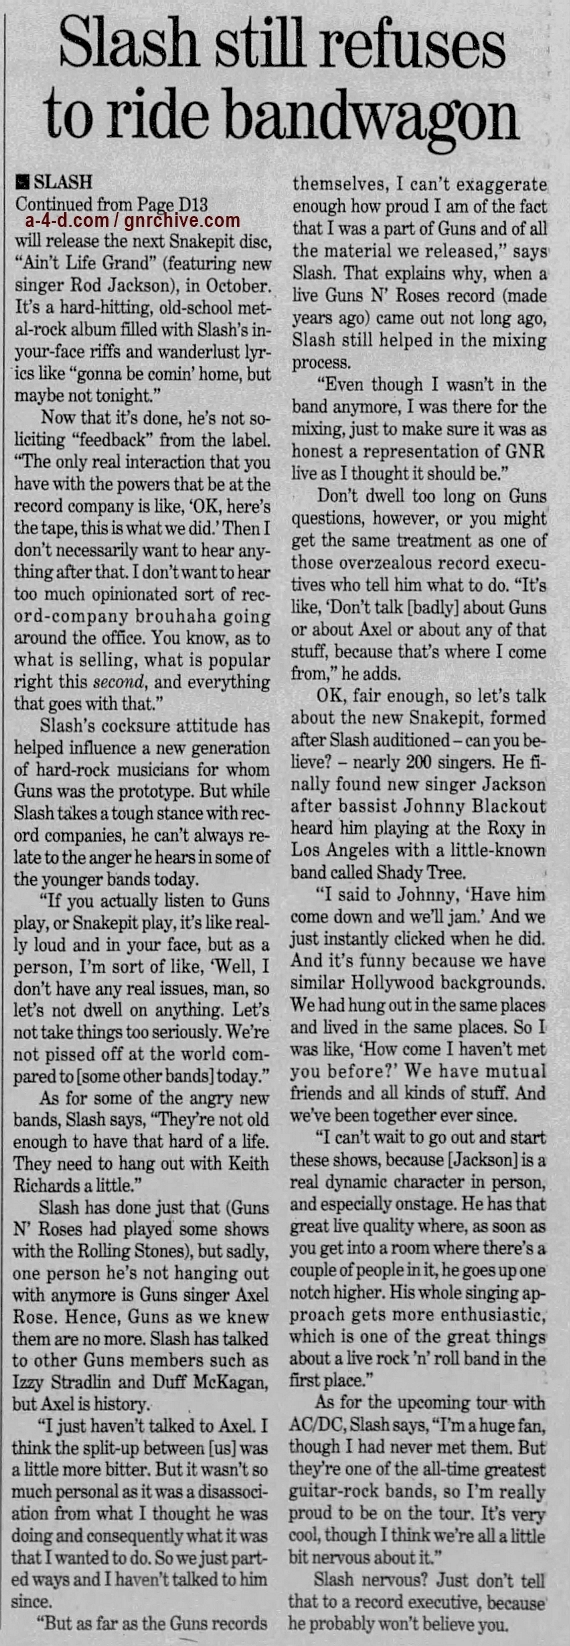 2000.08.04 - The Boston Globe - Slash, Without Compromise 2000_051